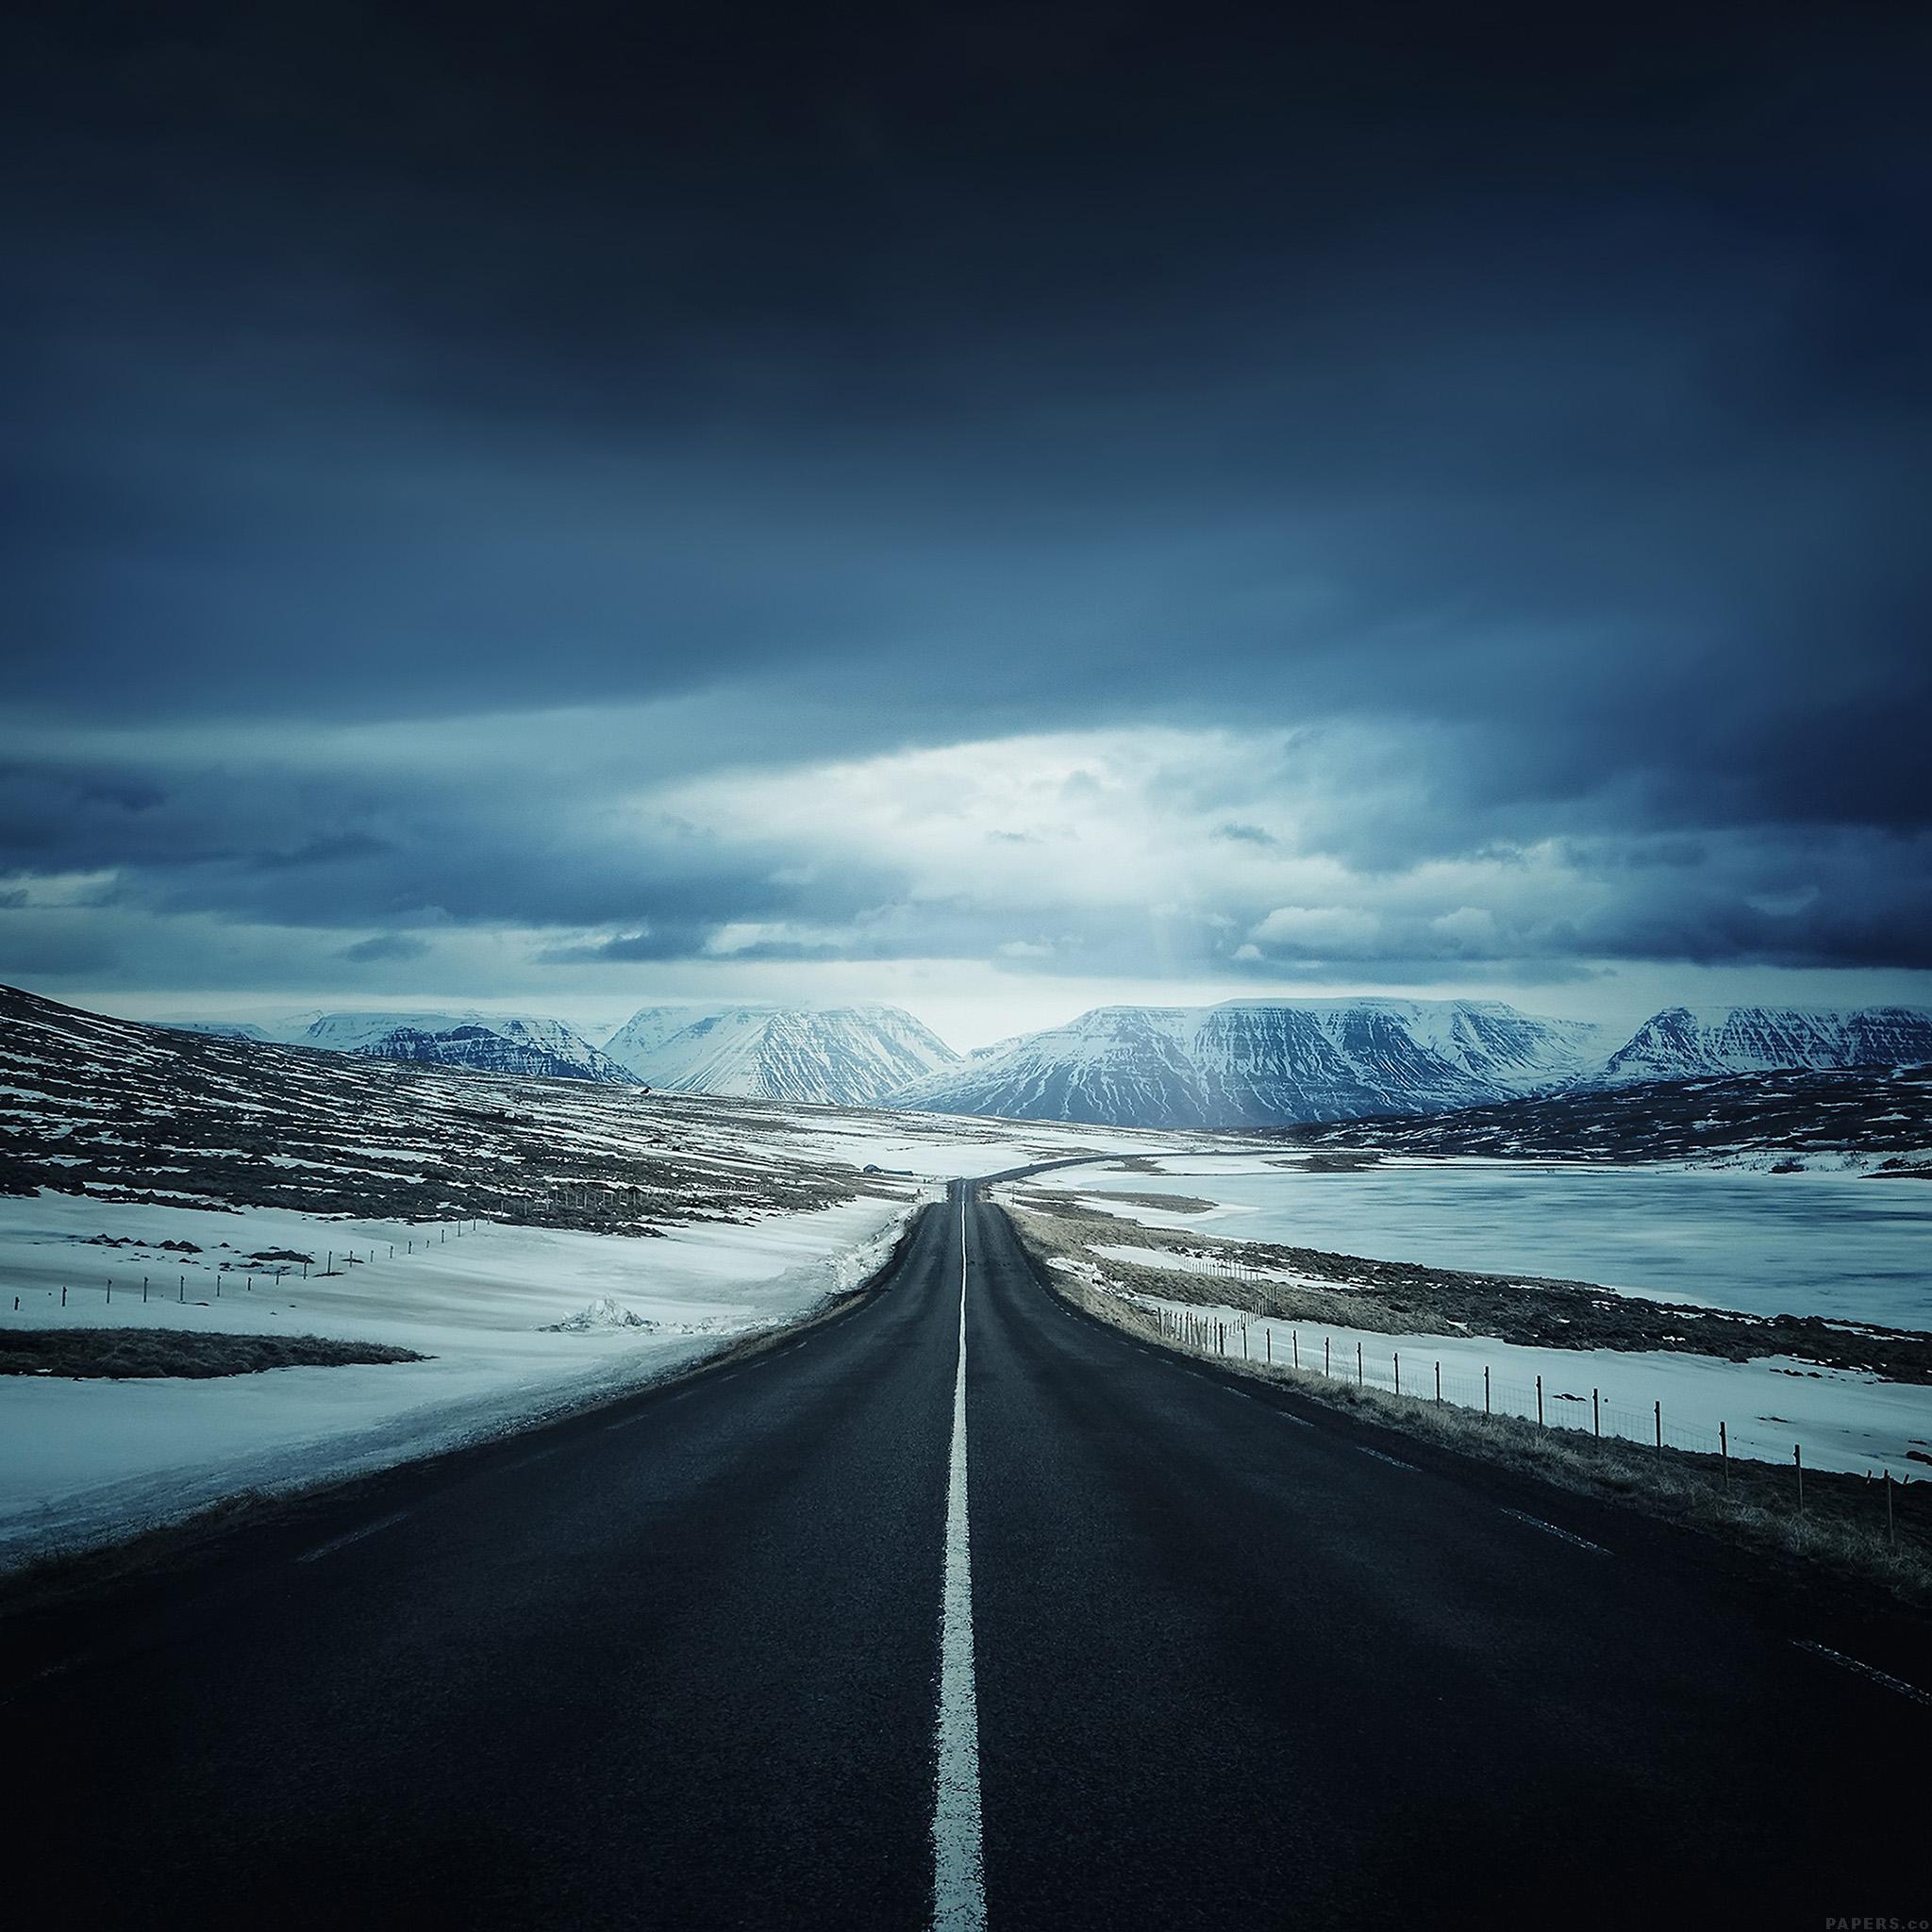 Winter Wallpaper: WALLPAPERS